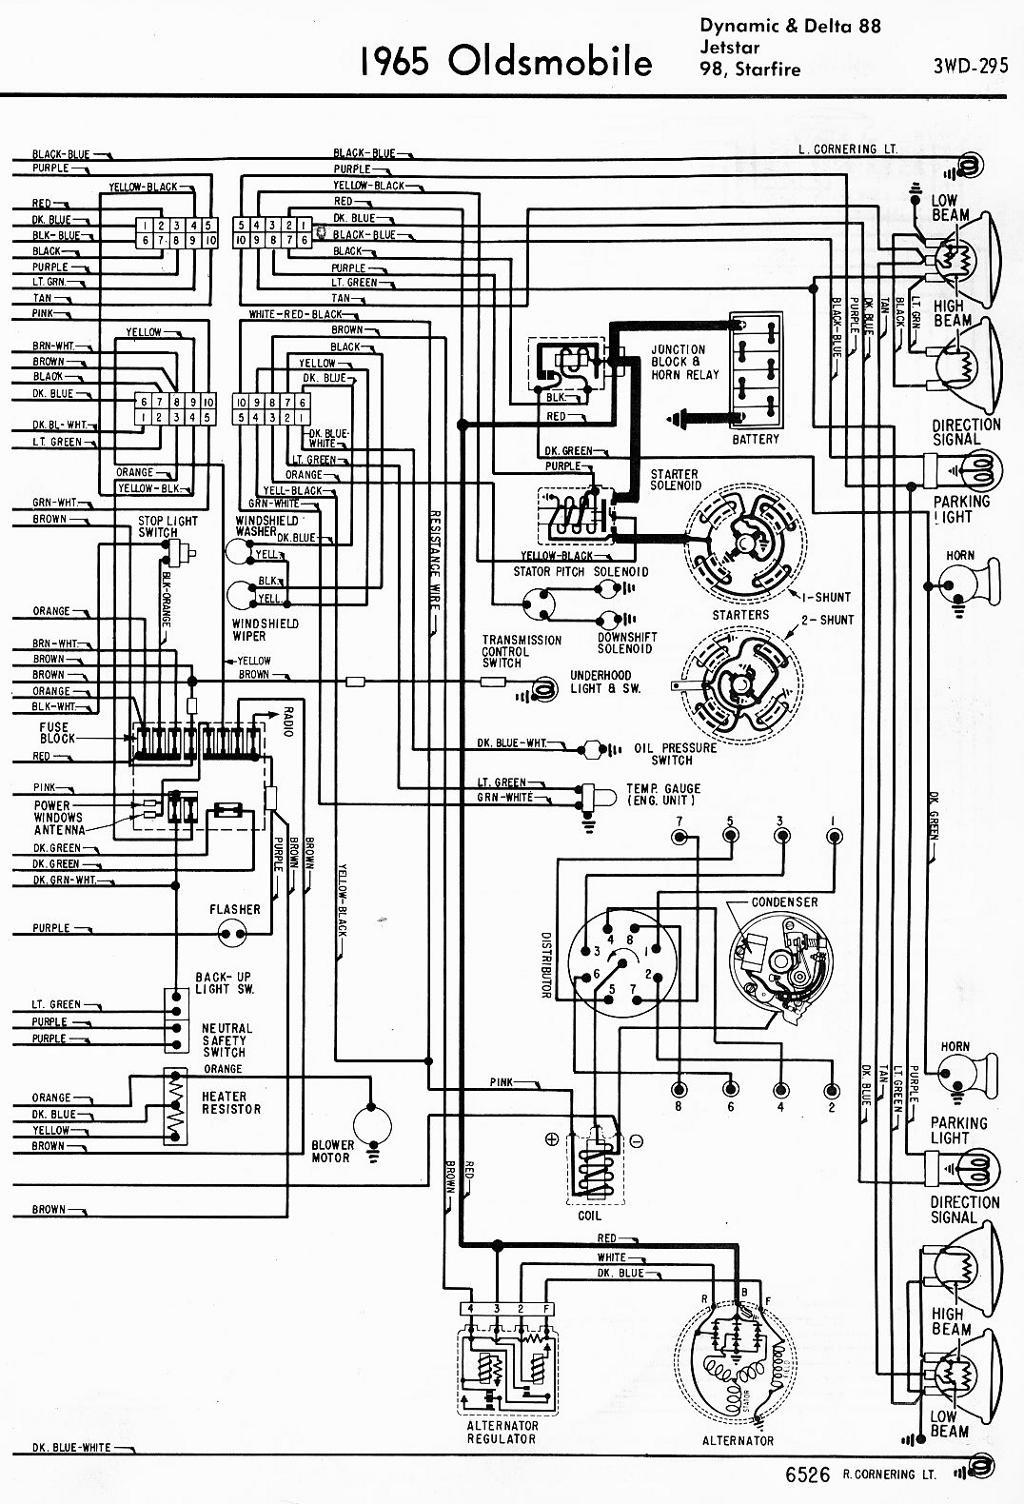 medium resolution of 1992 oldsmobile 88 wiring diagram wiring diagram third level rh 10 8 19 jacobwinterstein com 1999 taurus wiring diagram 1999 buick century wiring diagram